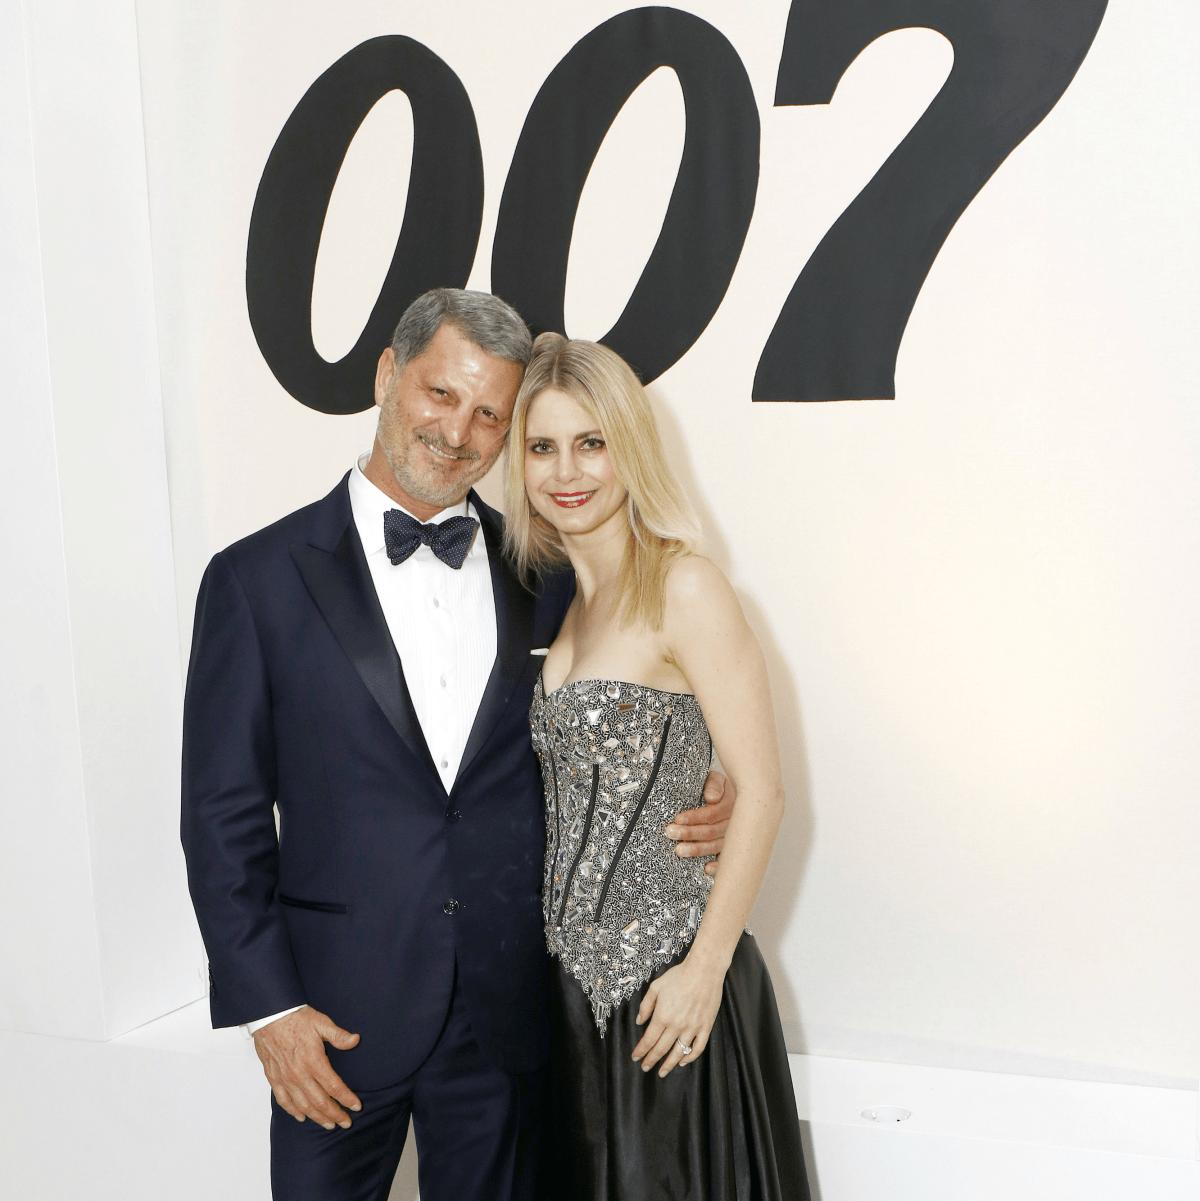 Darryl Freling, Emily Eisenhauer